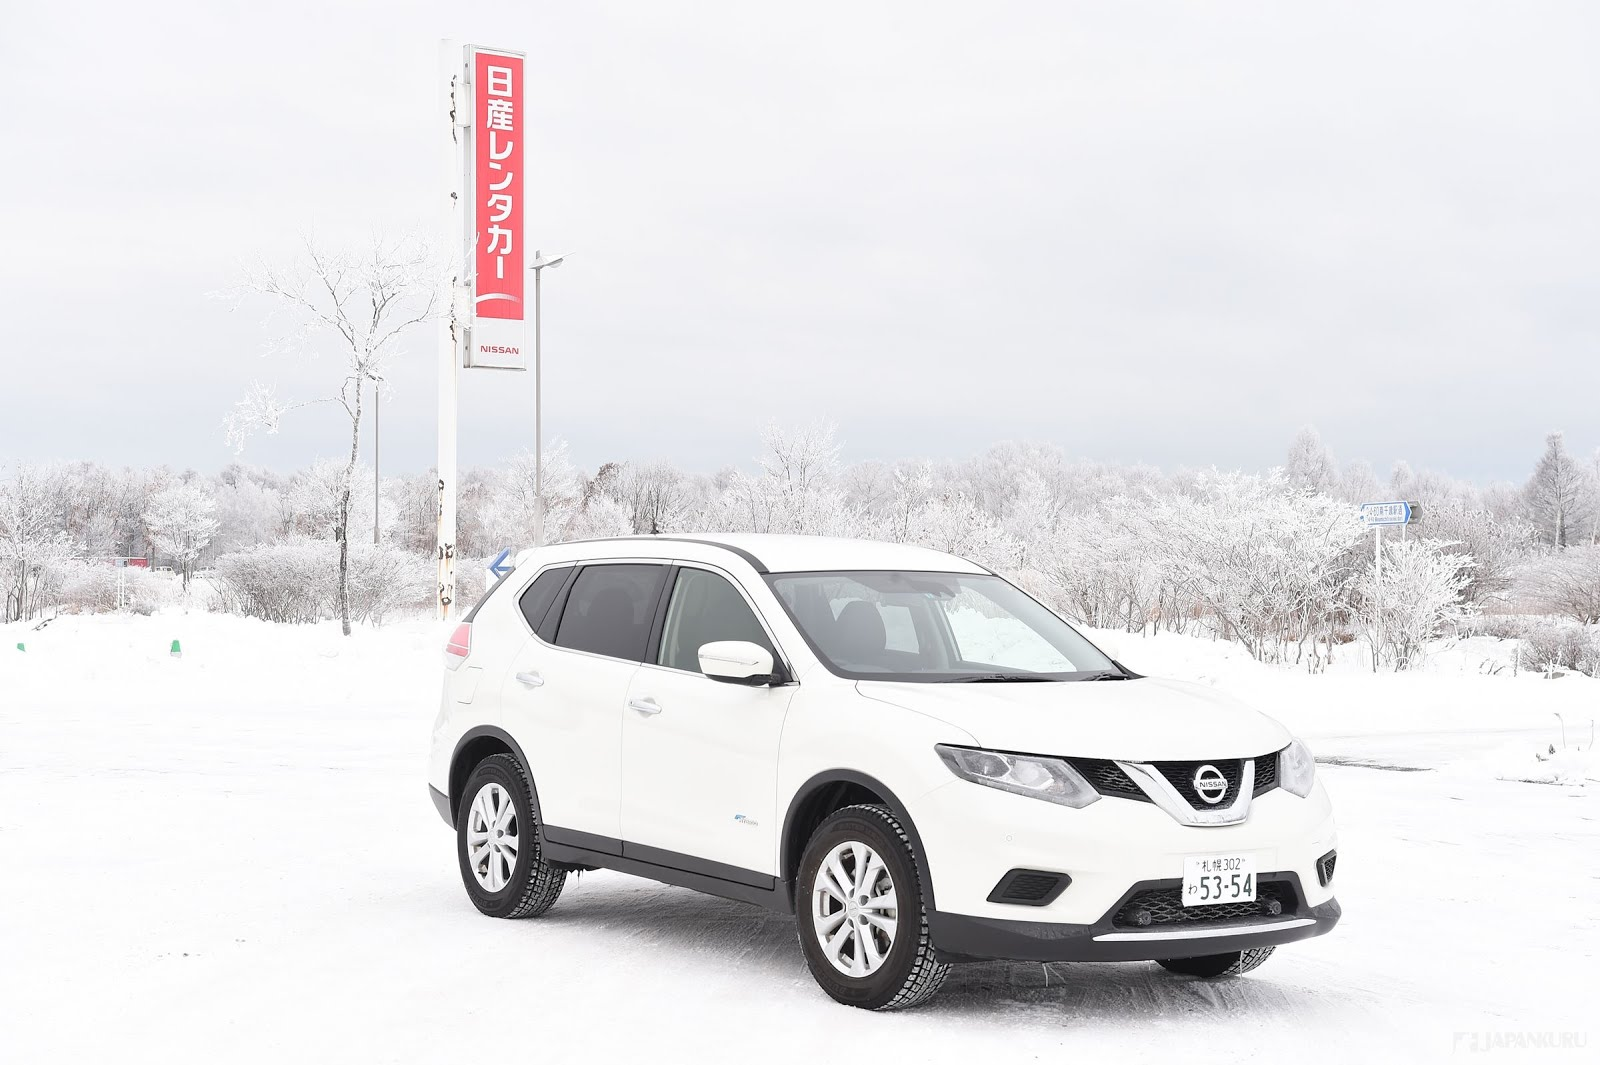 Hokkaido Travel Car Rental